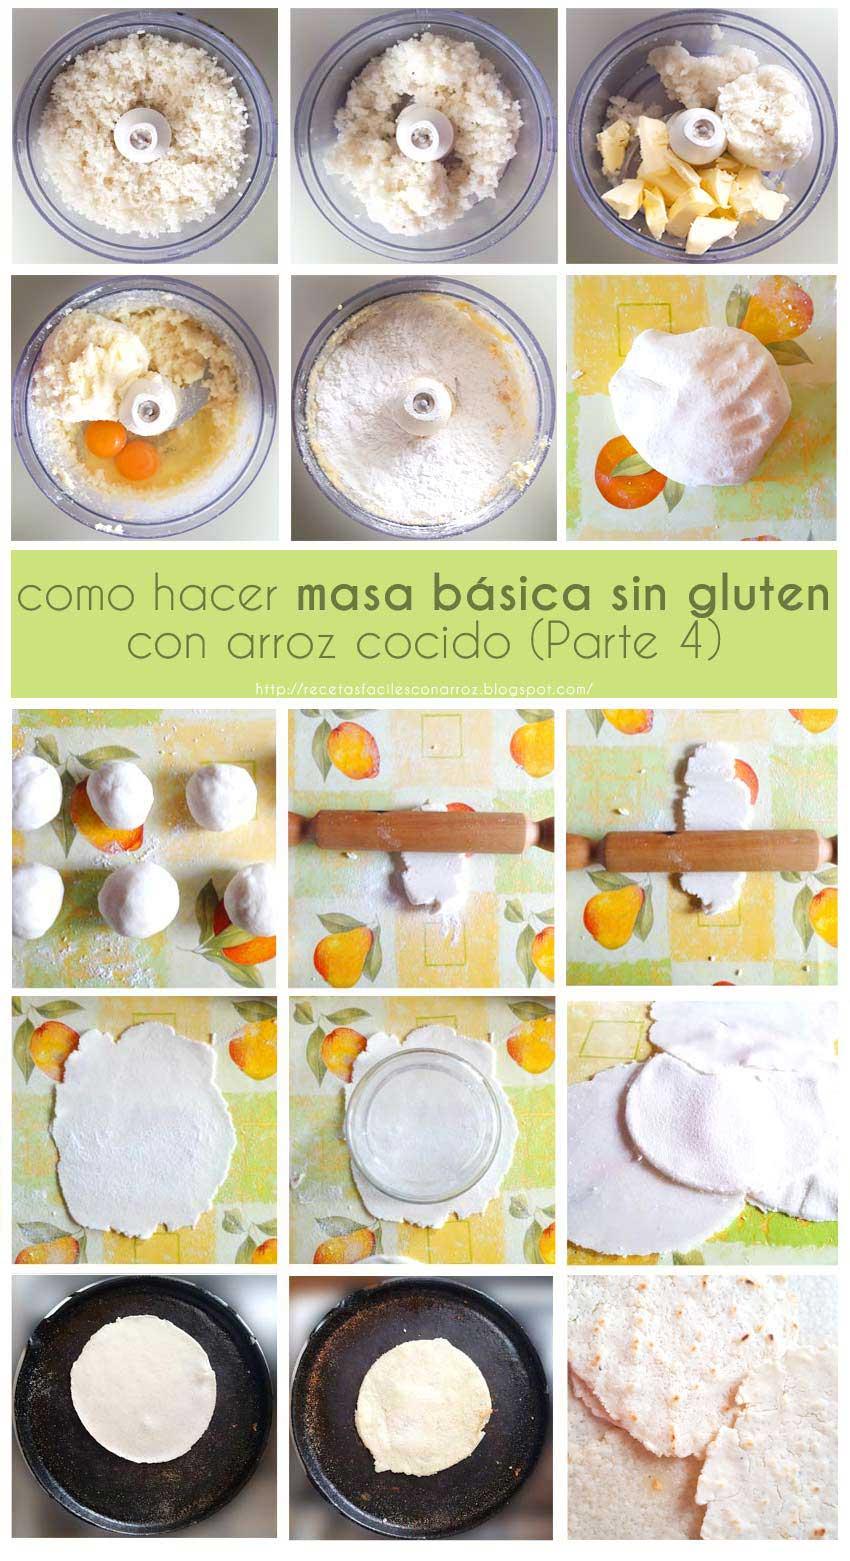 masa basica sin gluten fototutorial 4